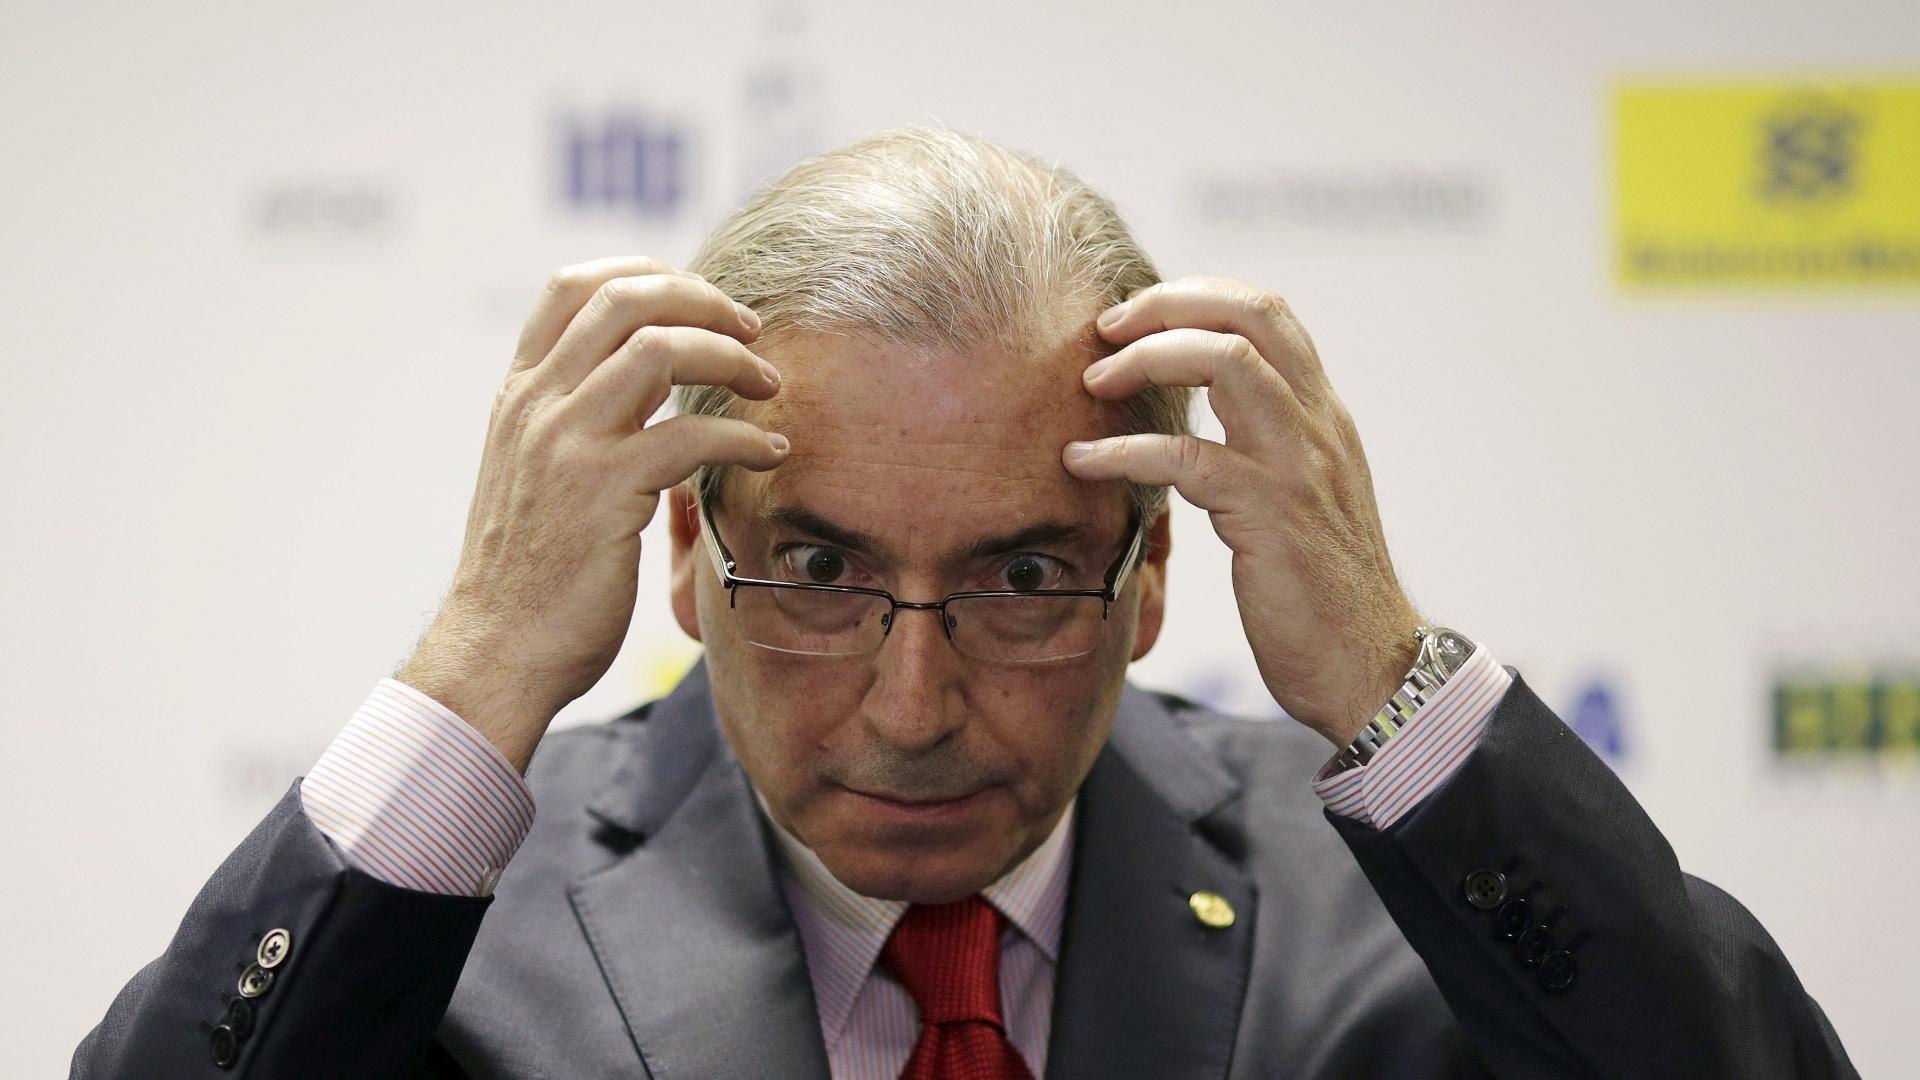 Janot vai denunciar Eduardo Cunha (PMDB/RJ) ao STF